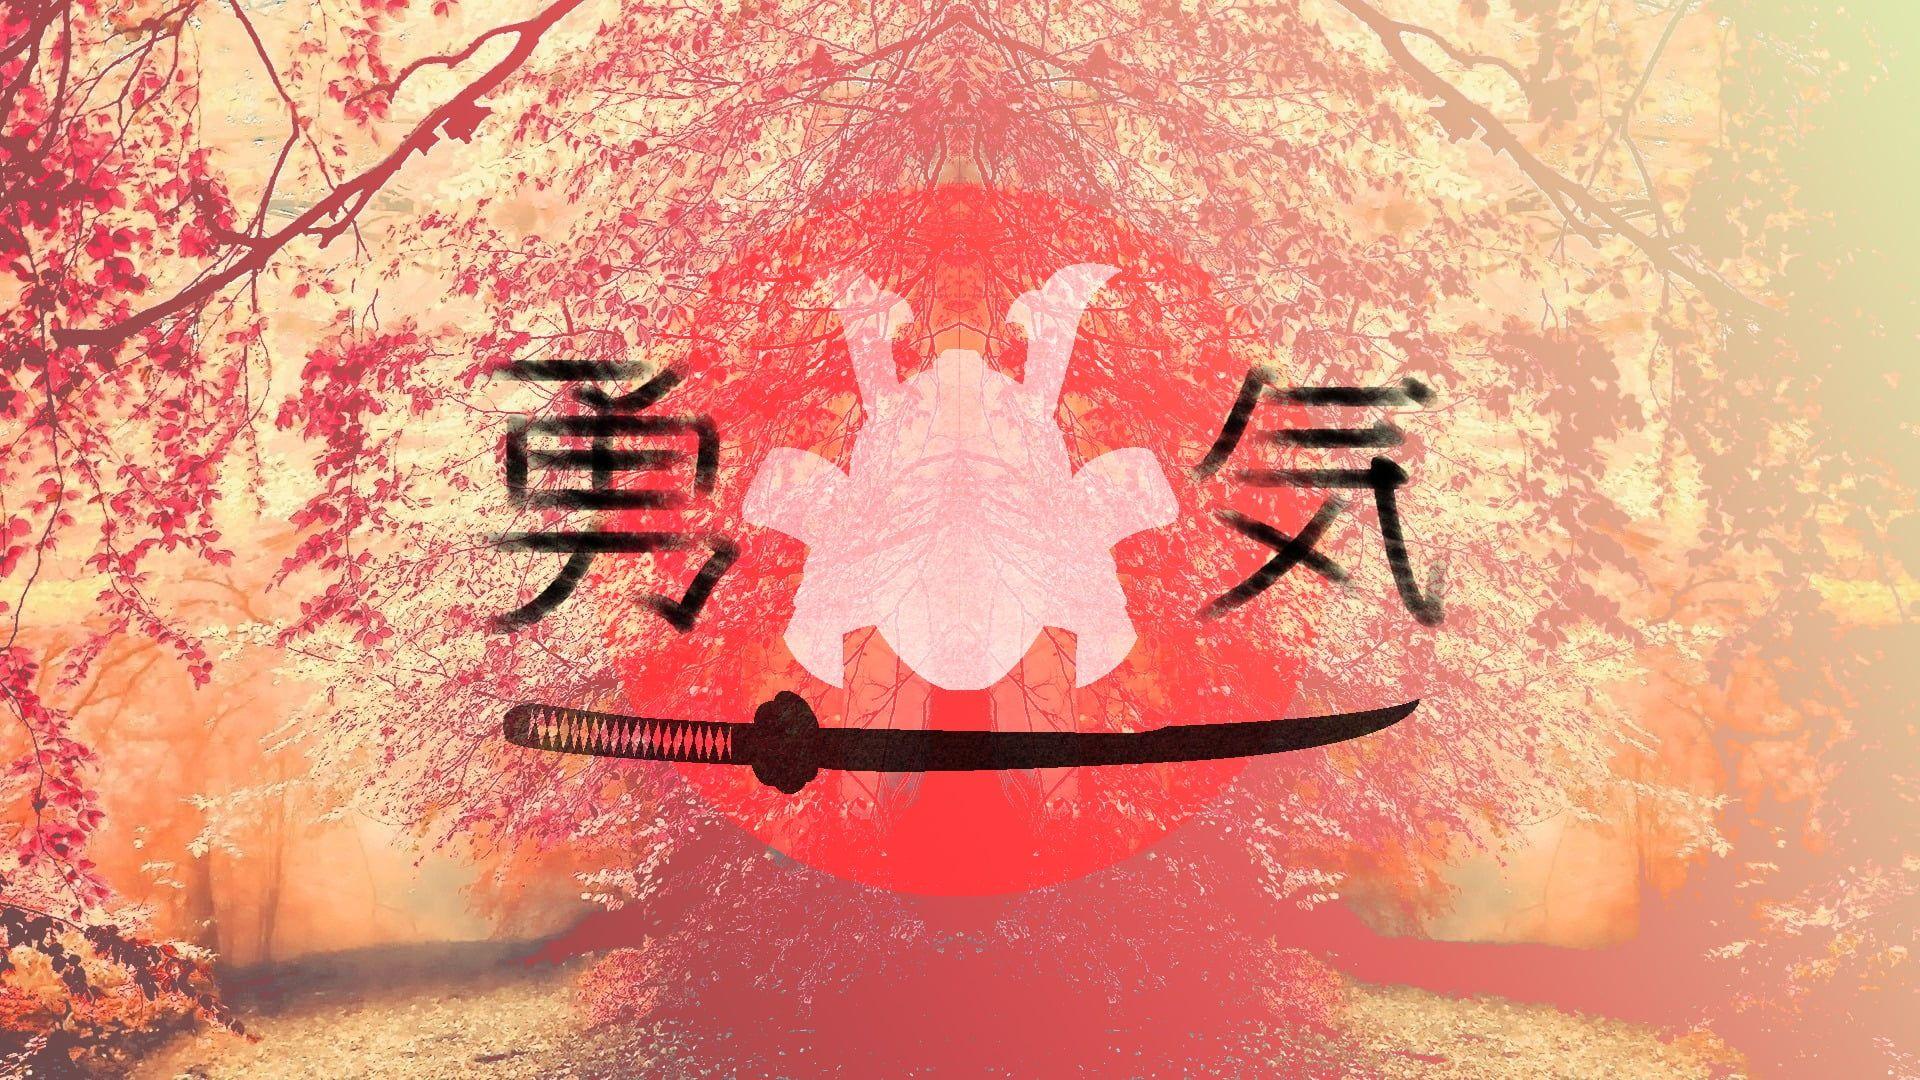 Pink Samurai Kanji Japan 1080p Wallpaper Hdwallpaper Desktop Anime Wallpaper Wallpaper Samurai 10 wallpaper anime samurai